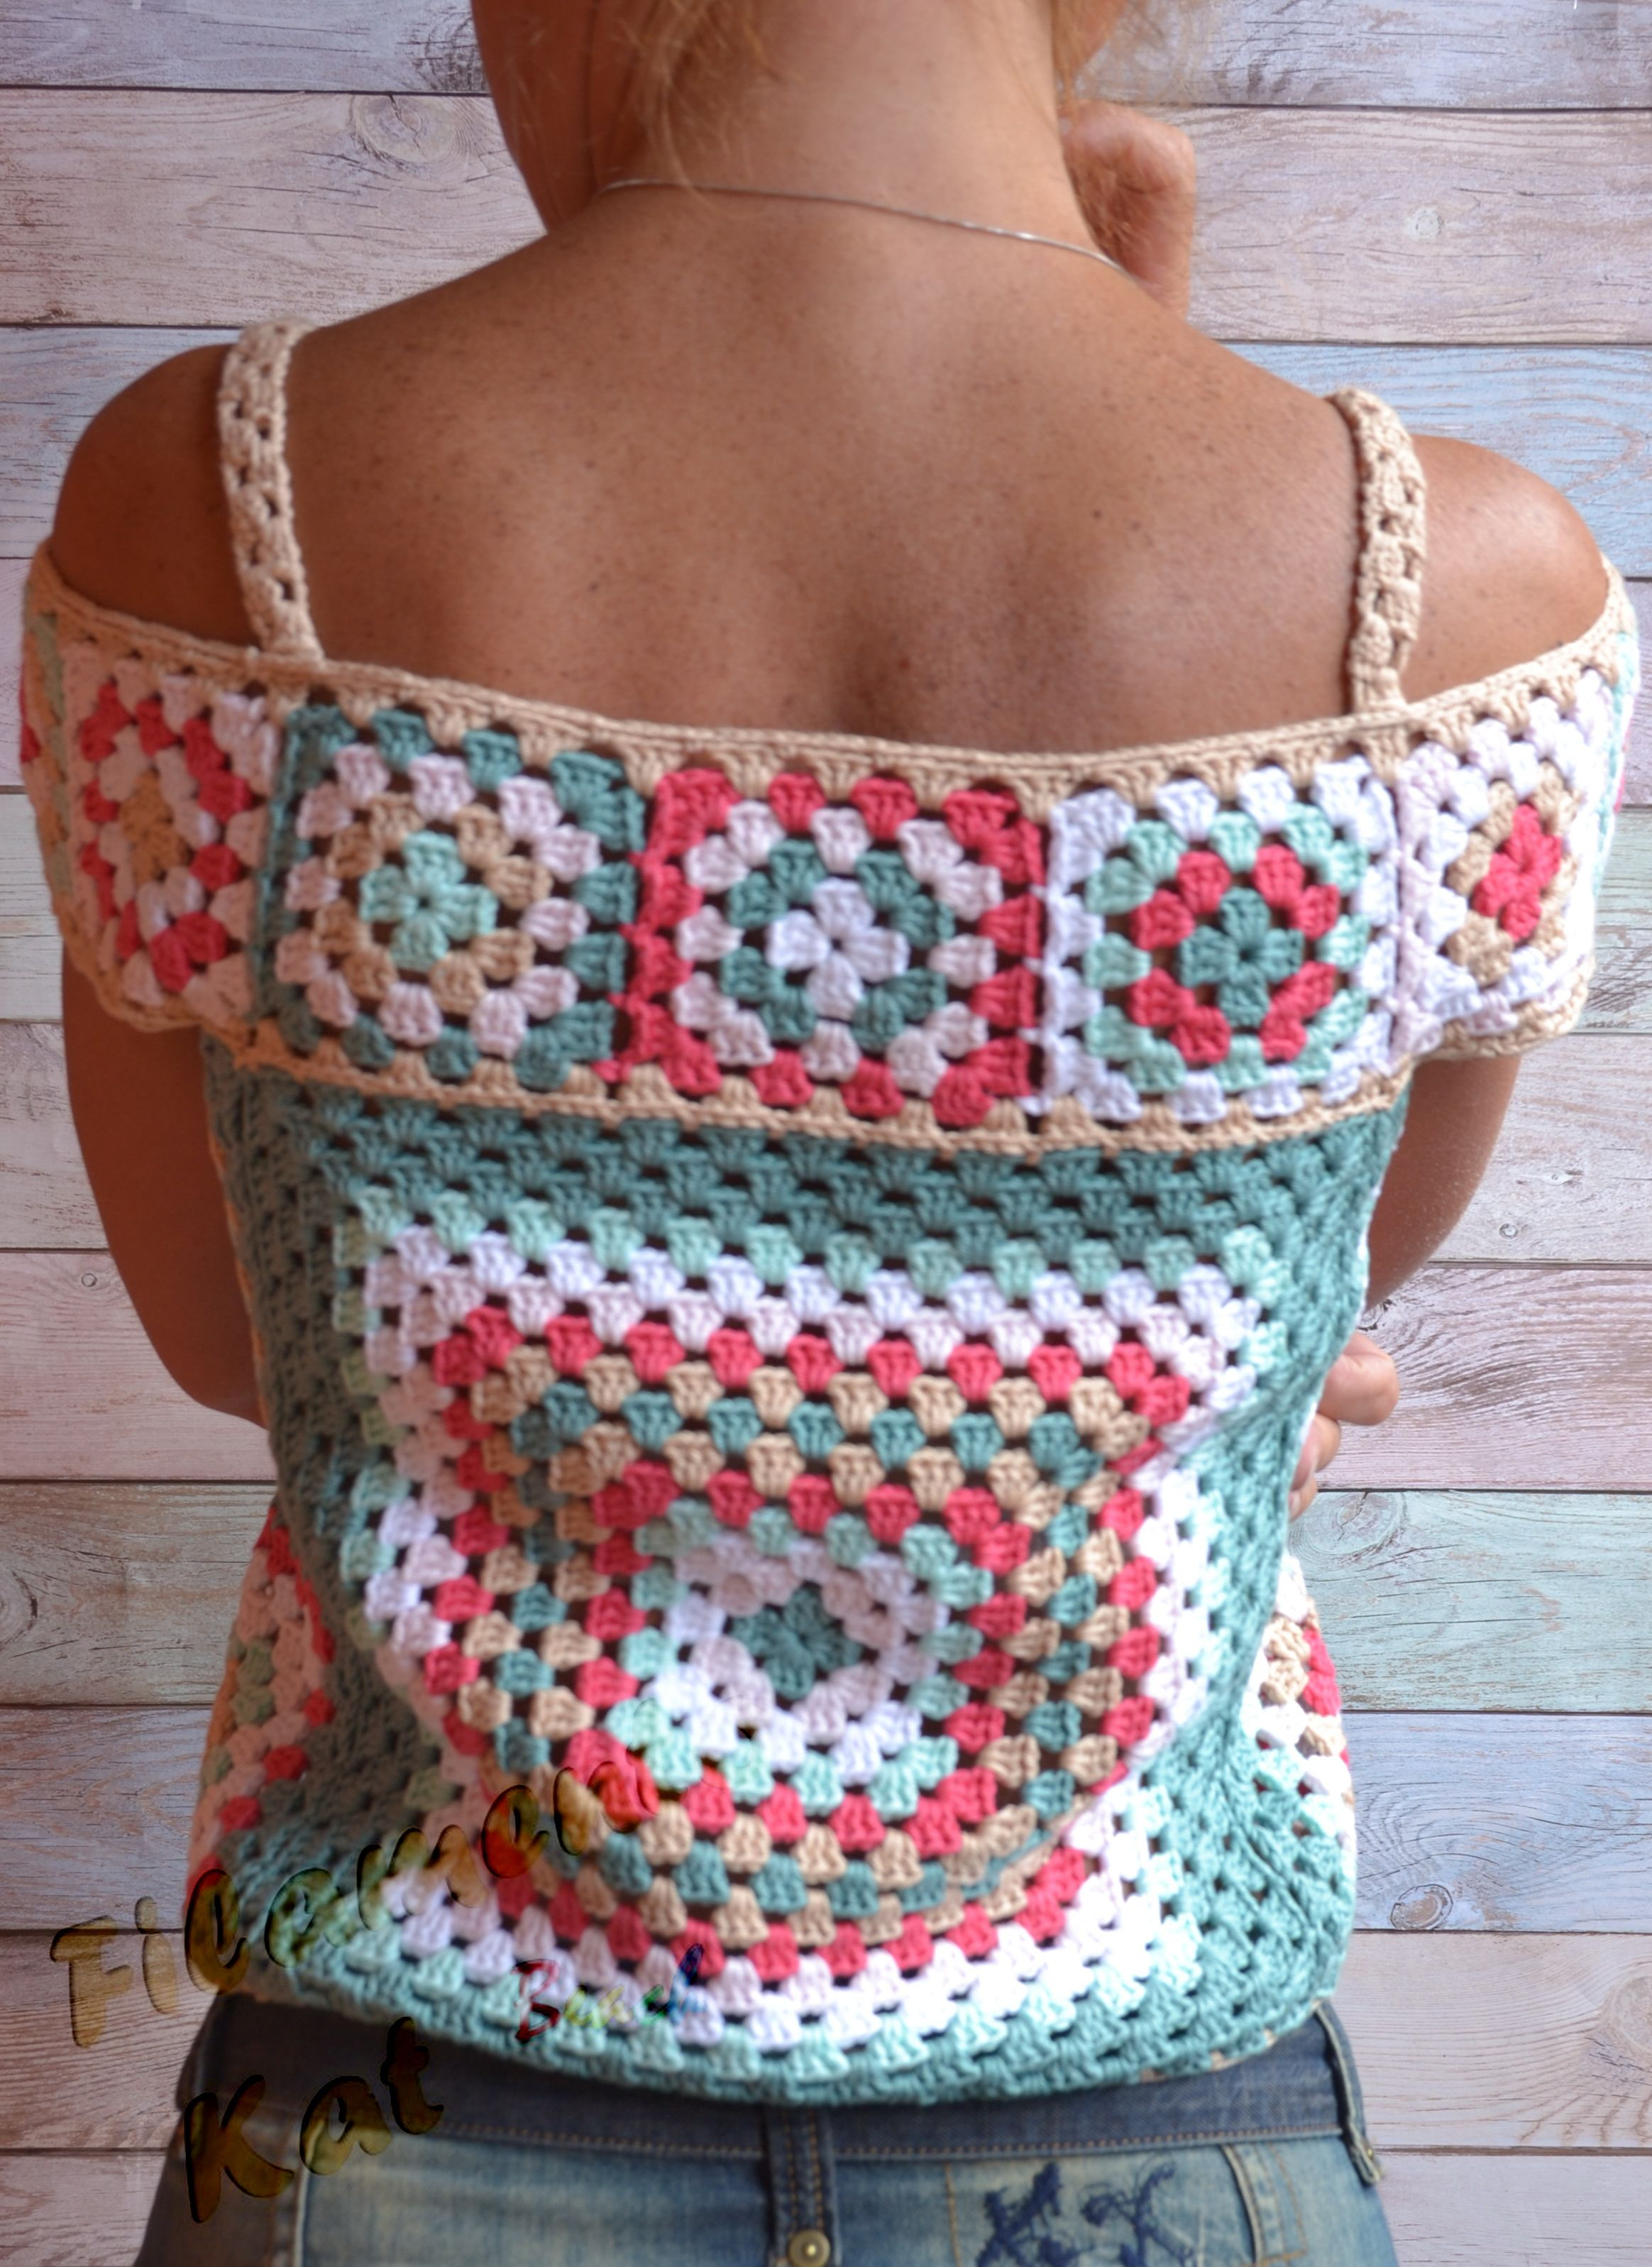 Crochet Summer Lace Top Ethic style Blouse Multicolor Crochet Granny's squares Cotton Top open shoul #grannysquareponcho